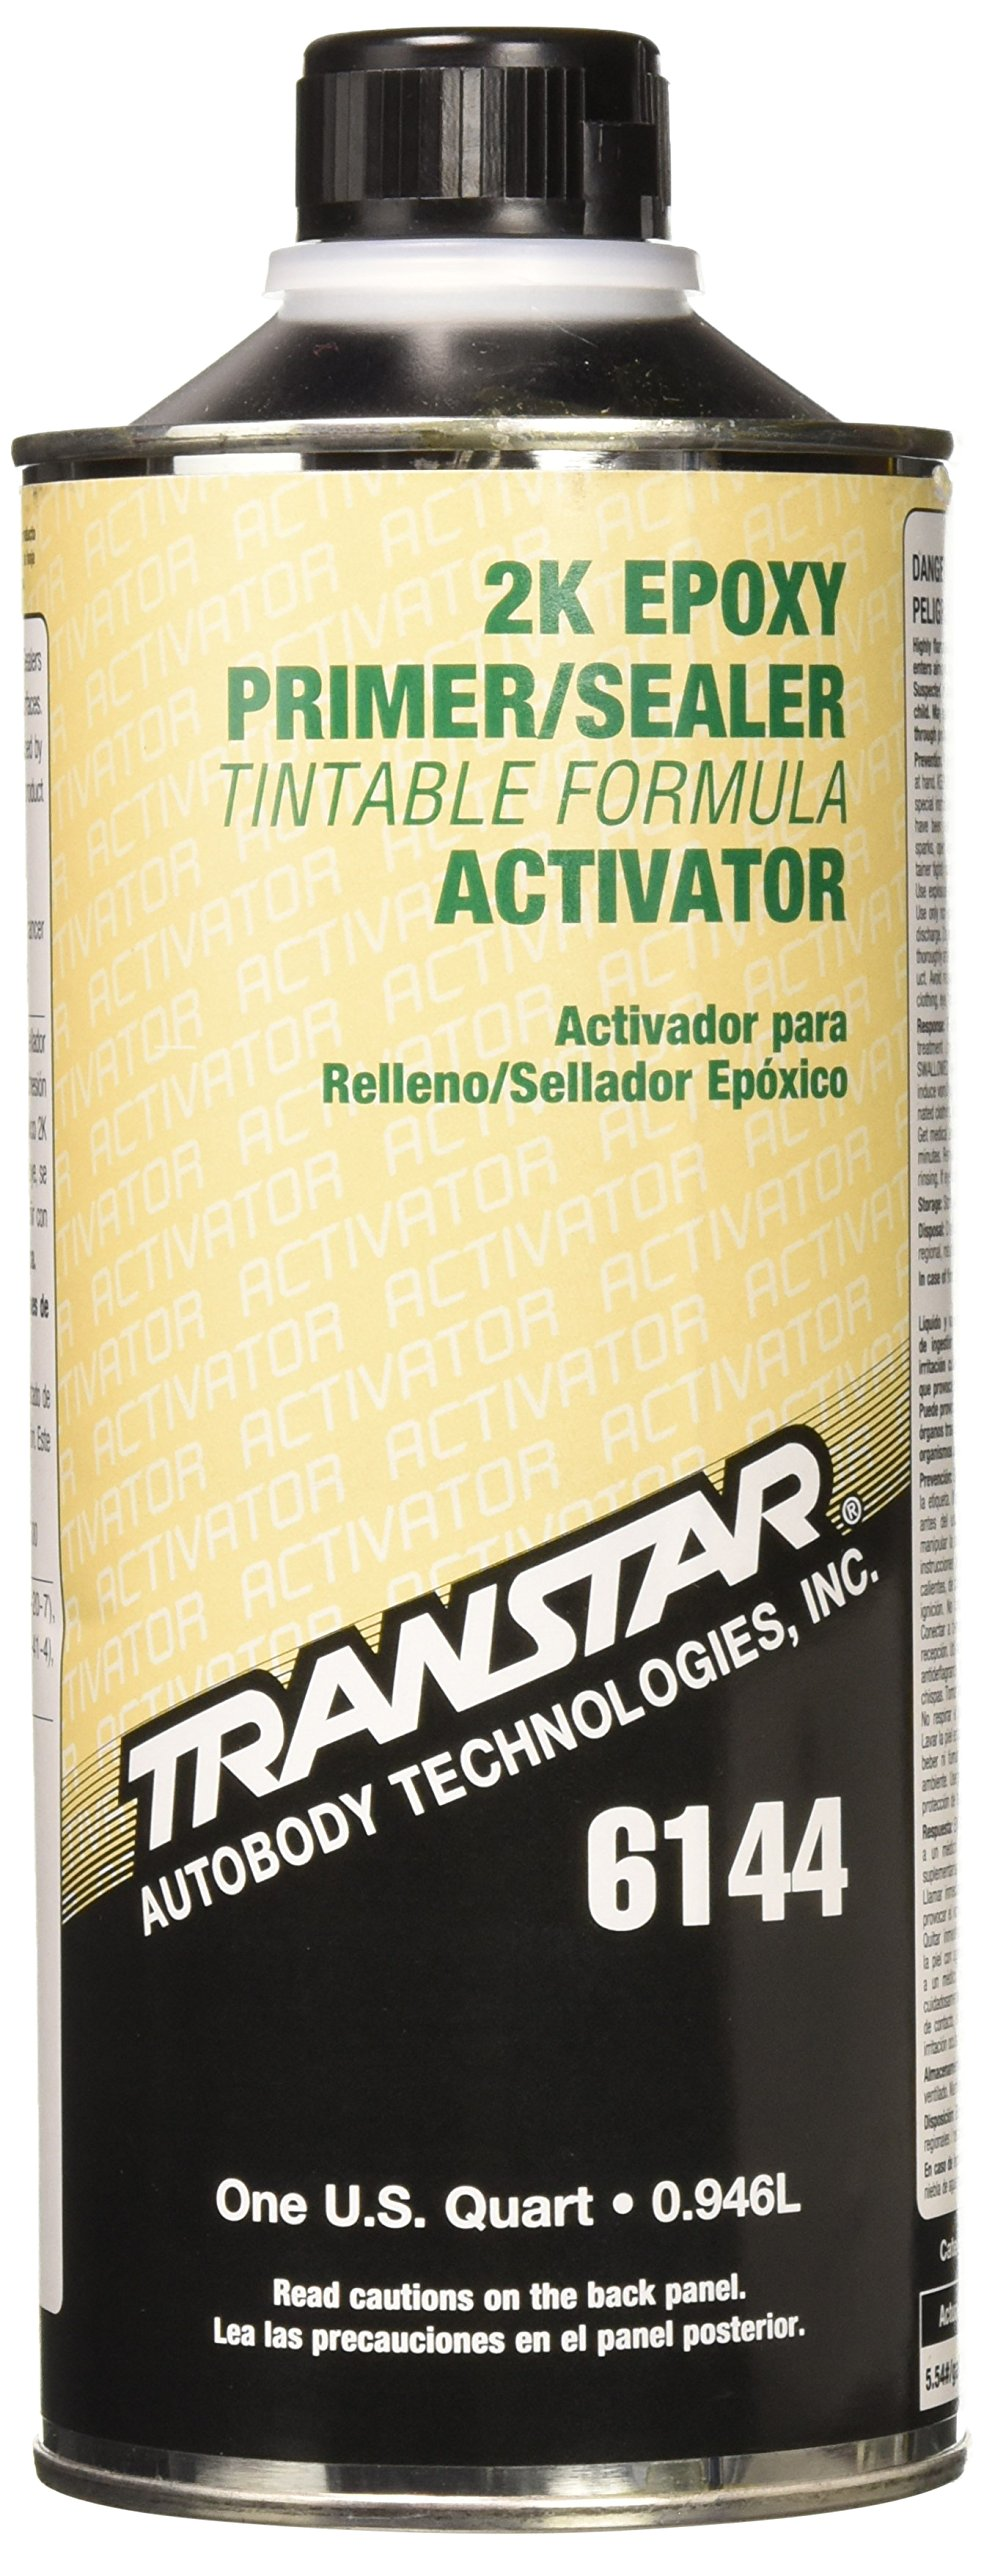 TRANSTAR 6144 Epoxy Primer Activator - 1 Quart by TRANSTAR